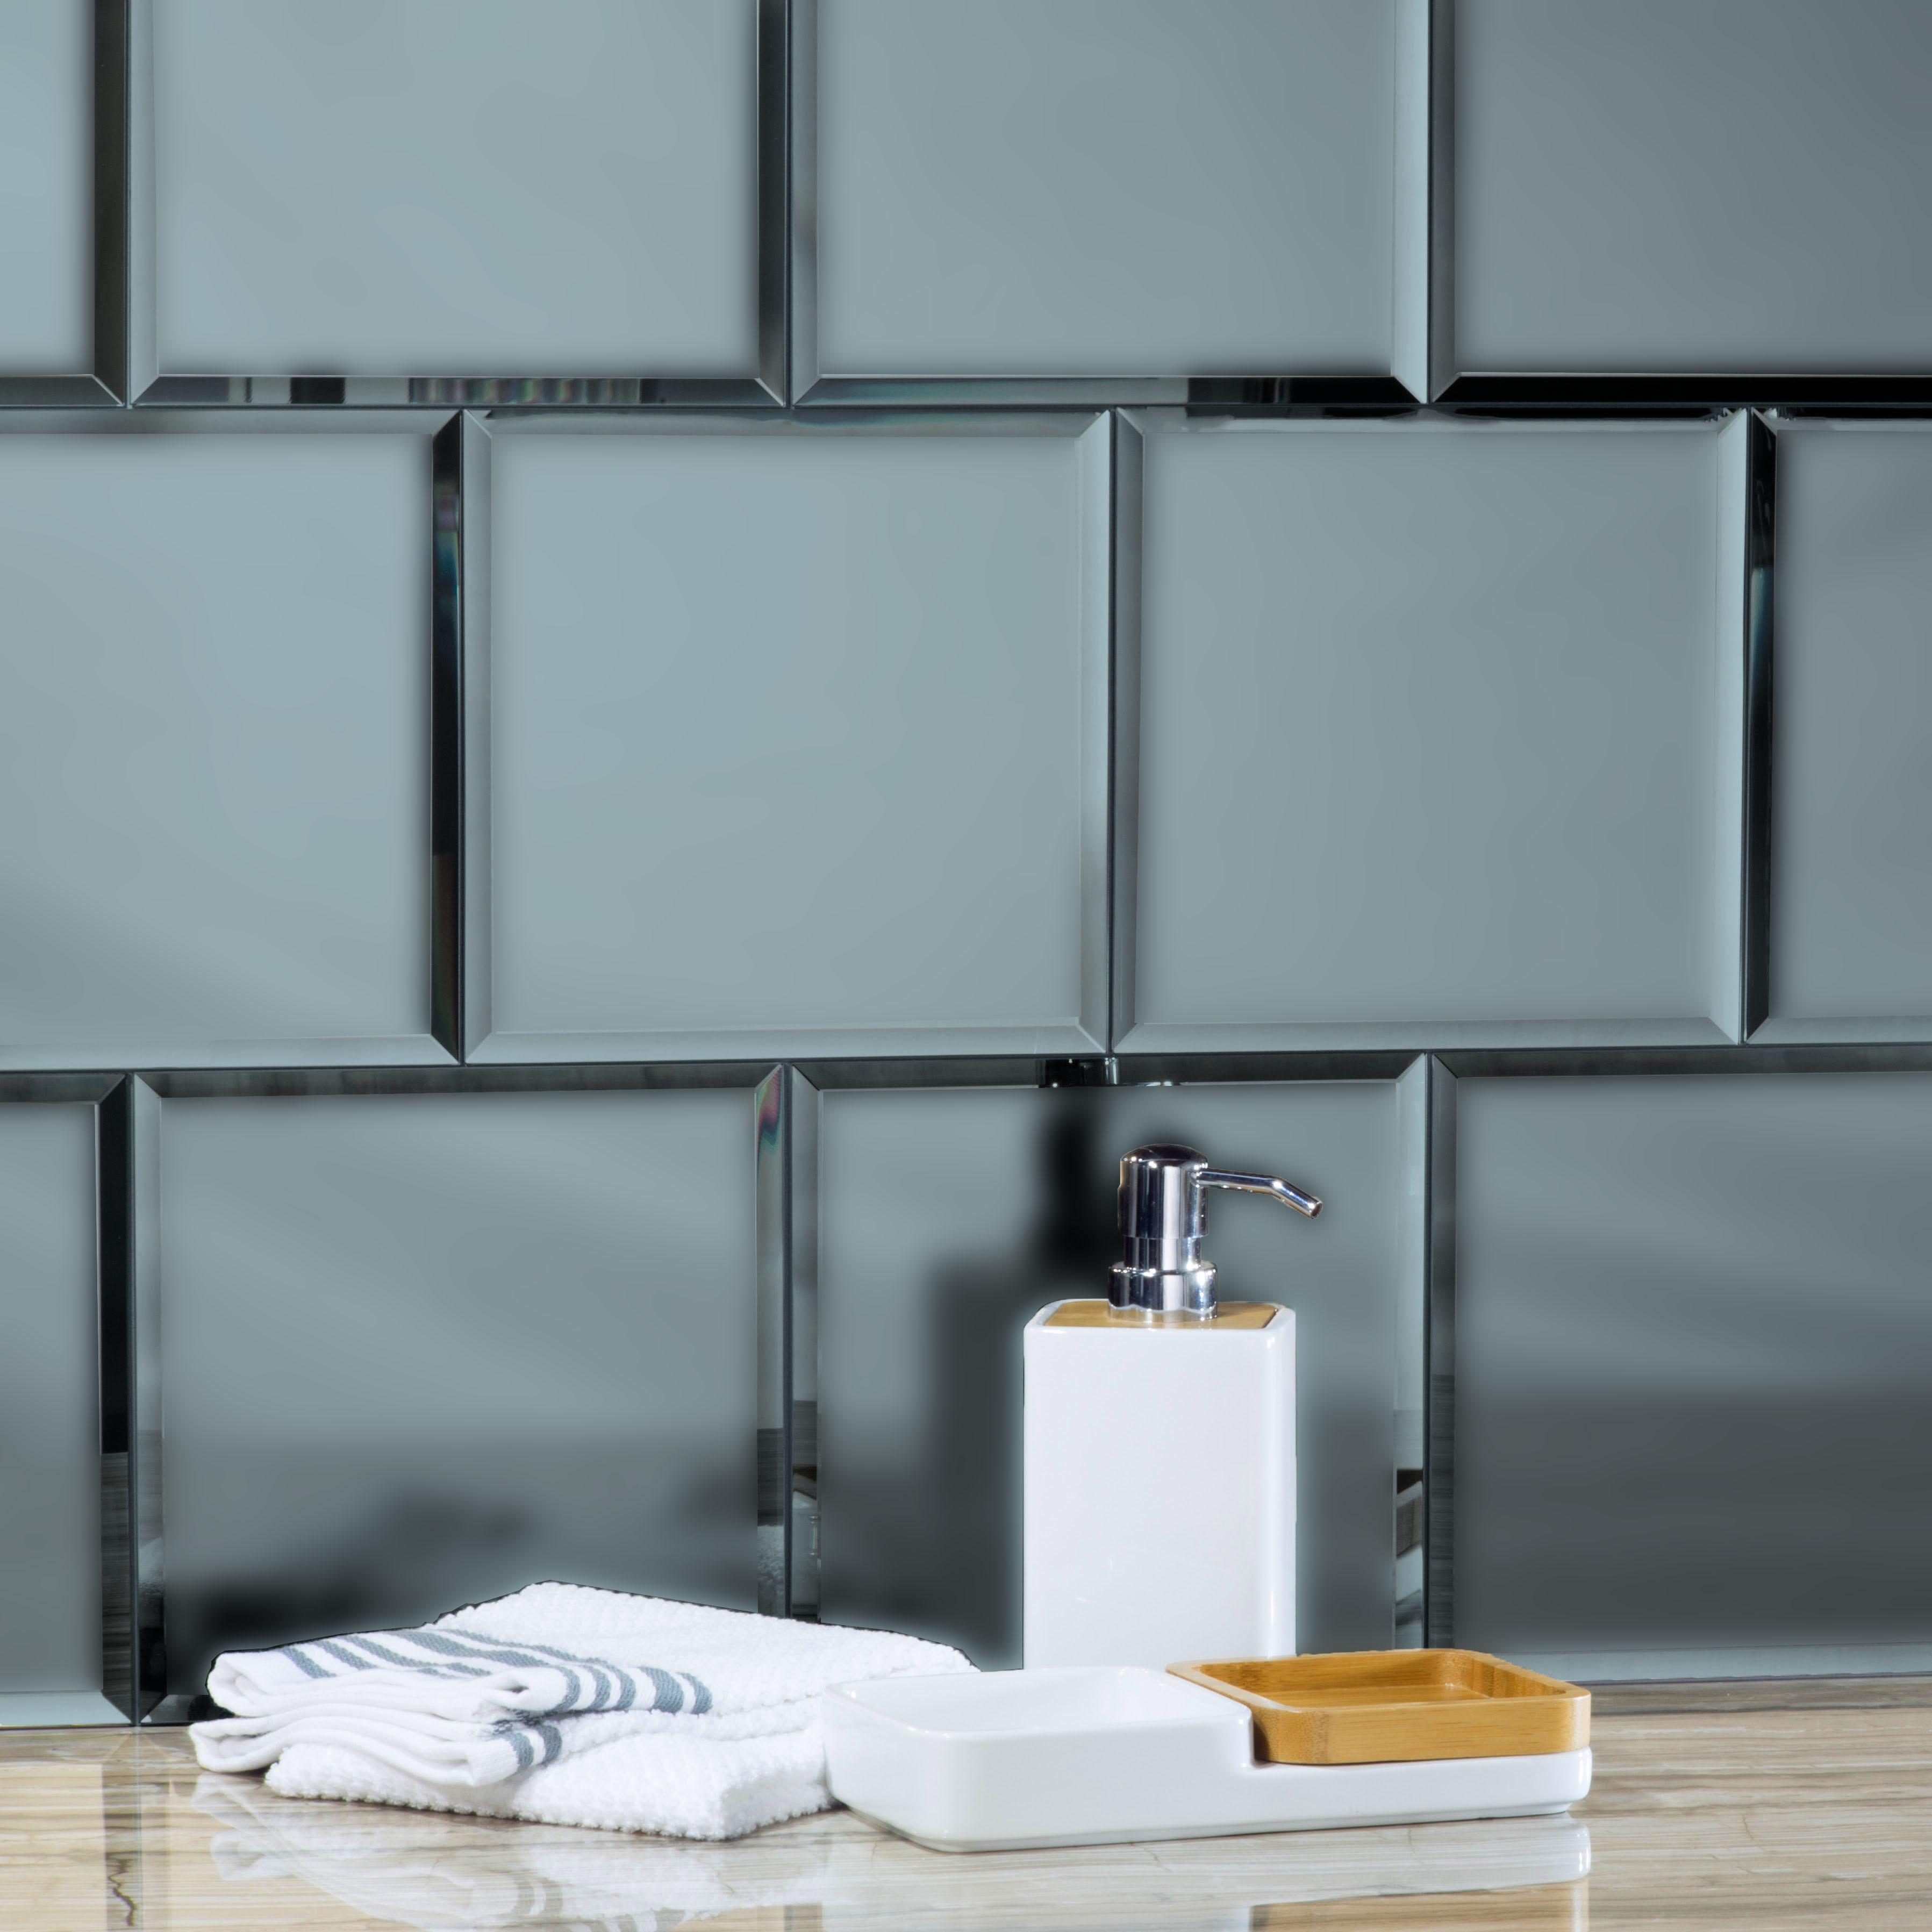 "Reflections 8"" x 8"" Matte Gray Mirror Field Backsplash Wall Tile"